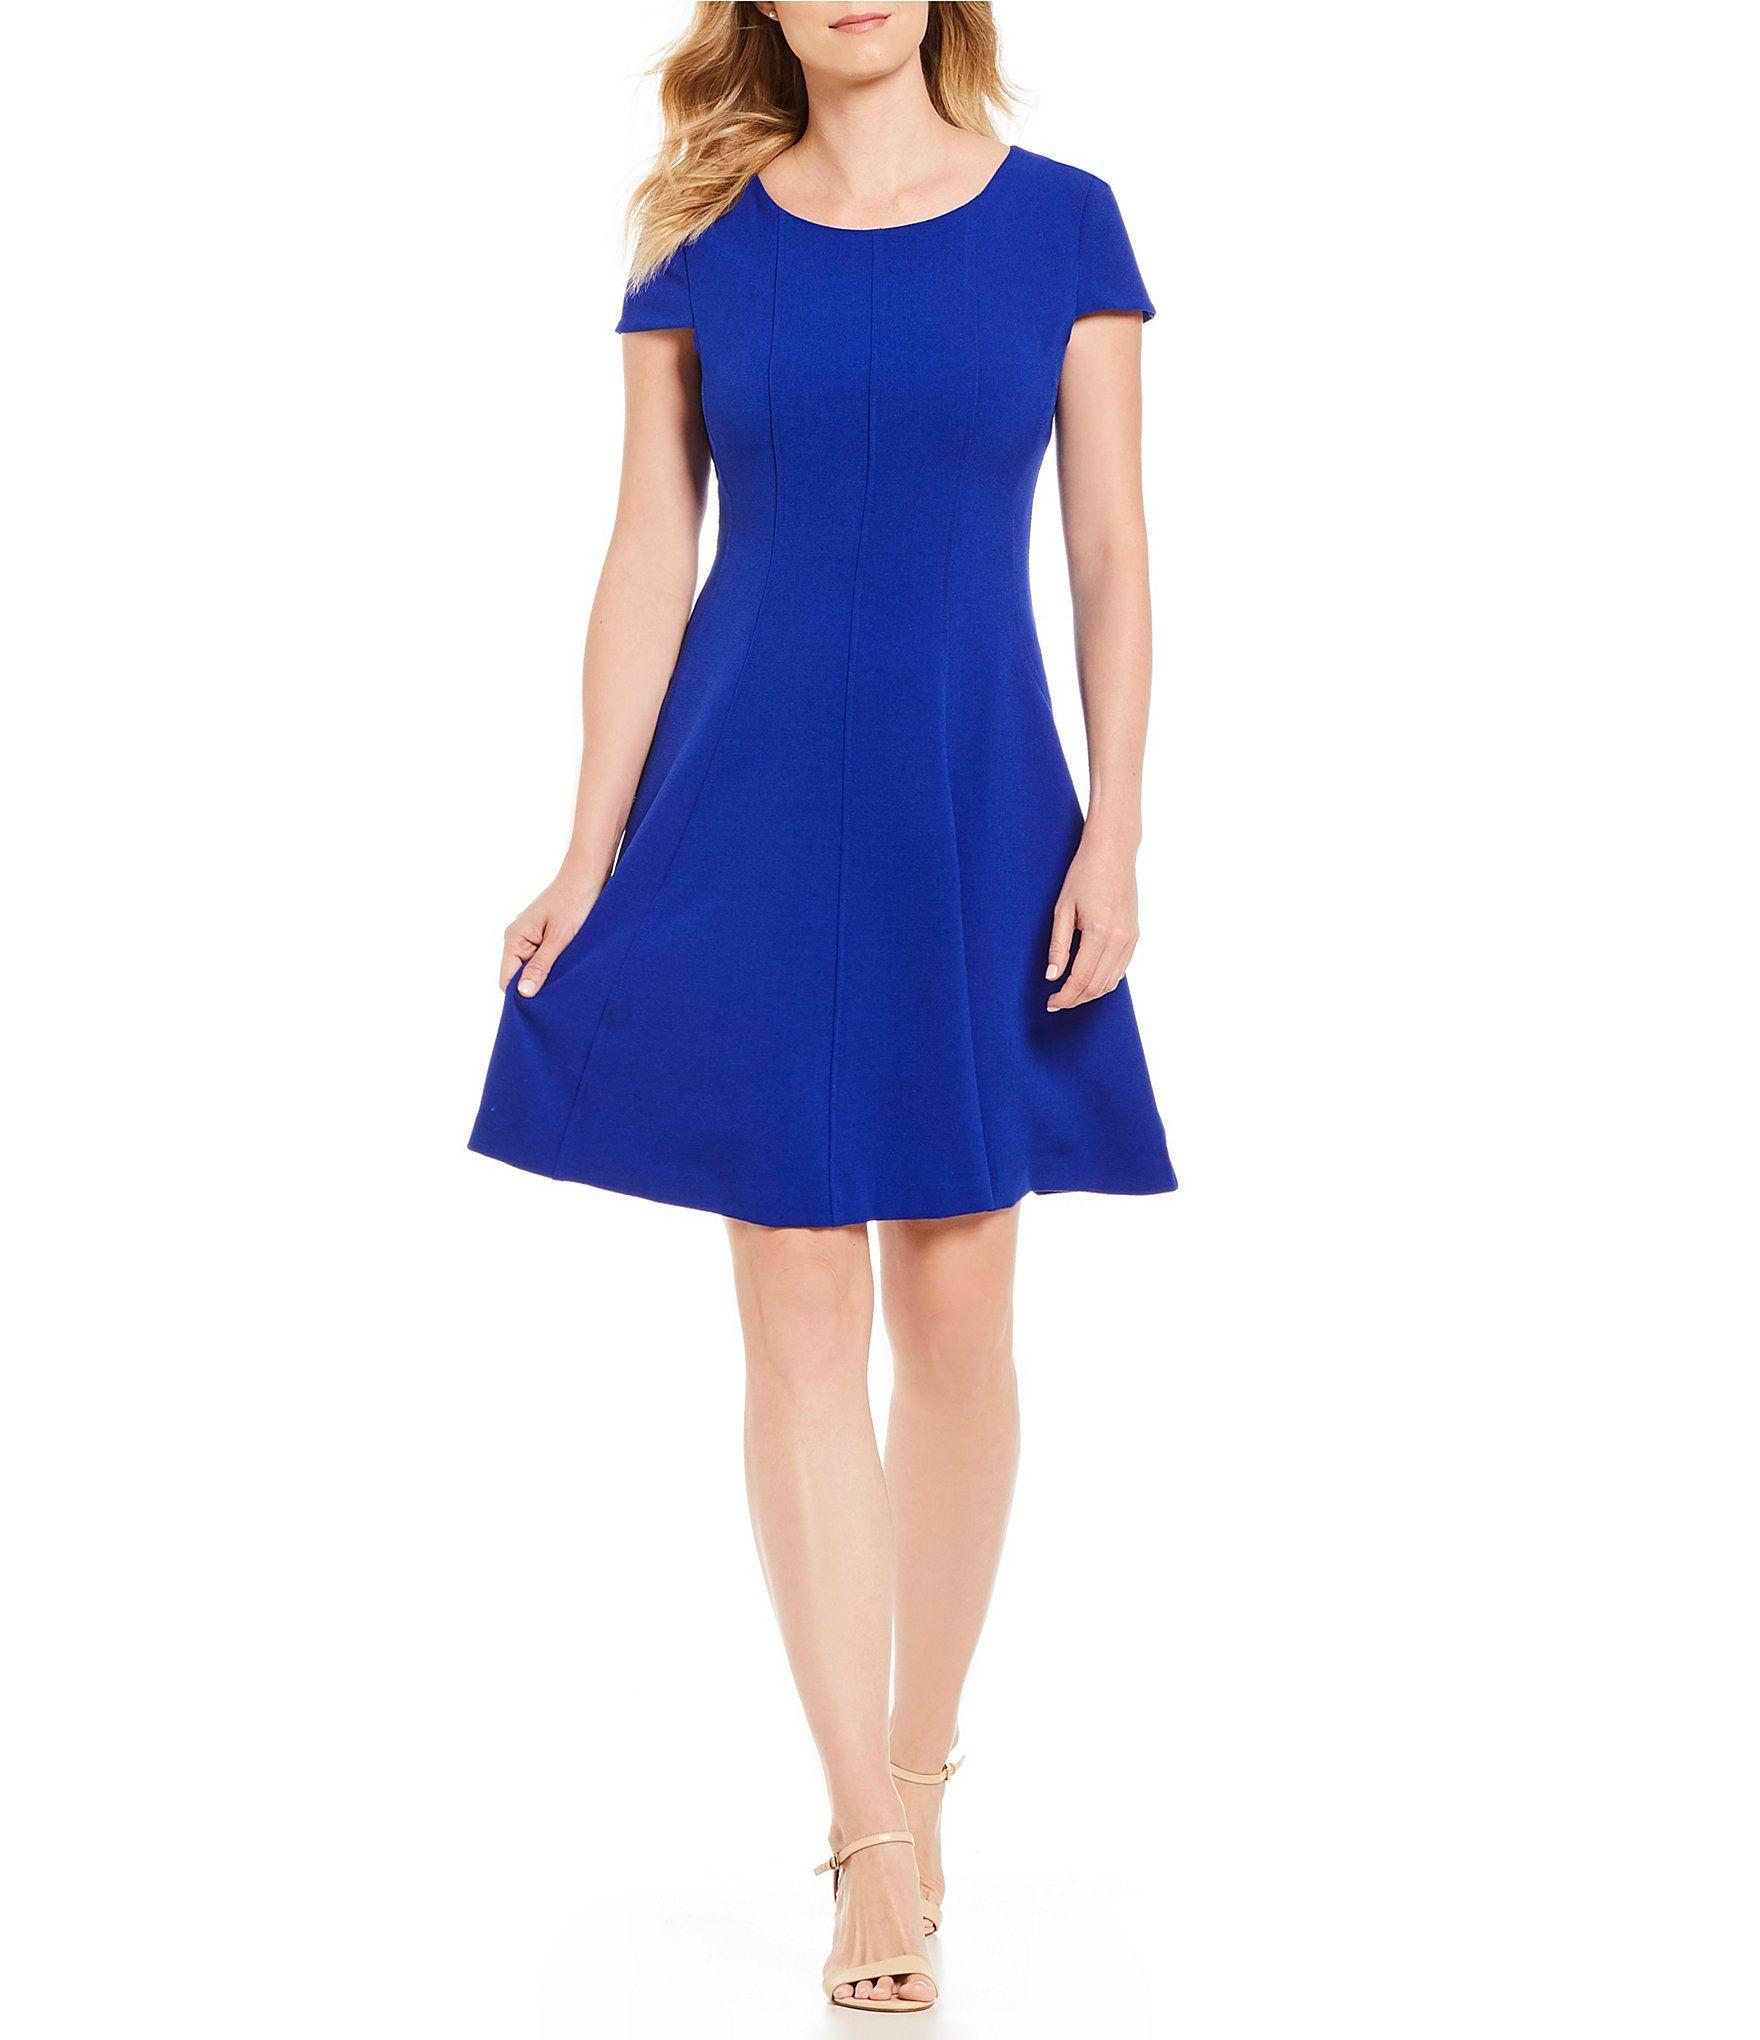 ba064f9e5d8 Shop for Jessica Howard Cap Sleeve Fit and Flare Dress at Dillards.com.  Visit